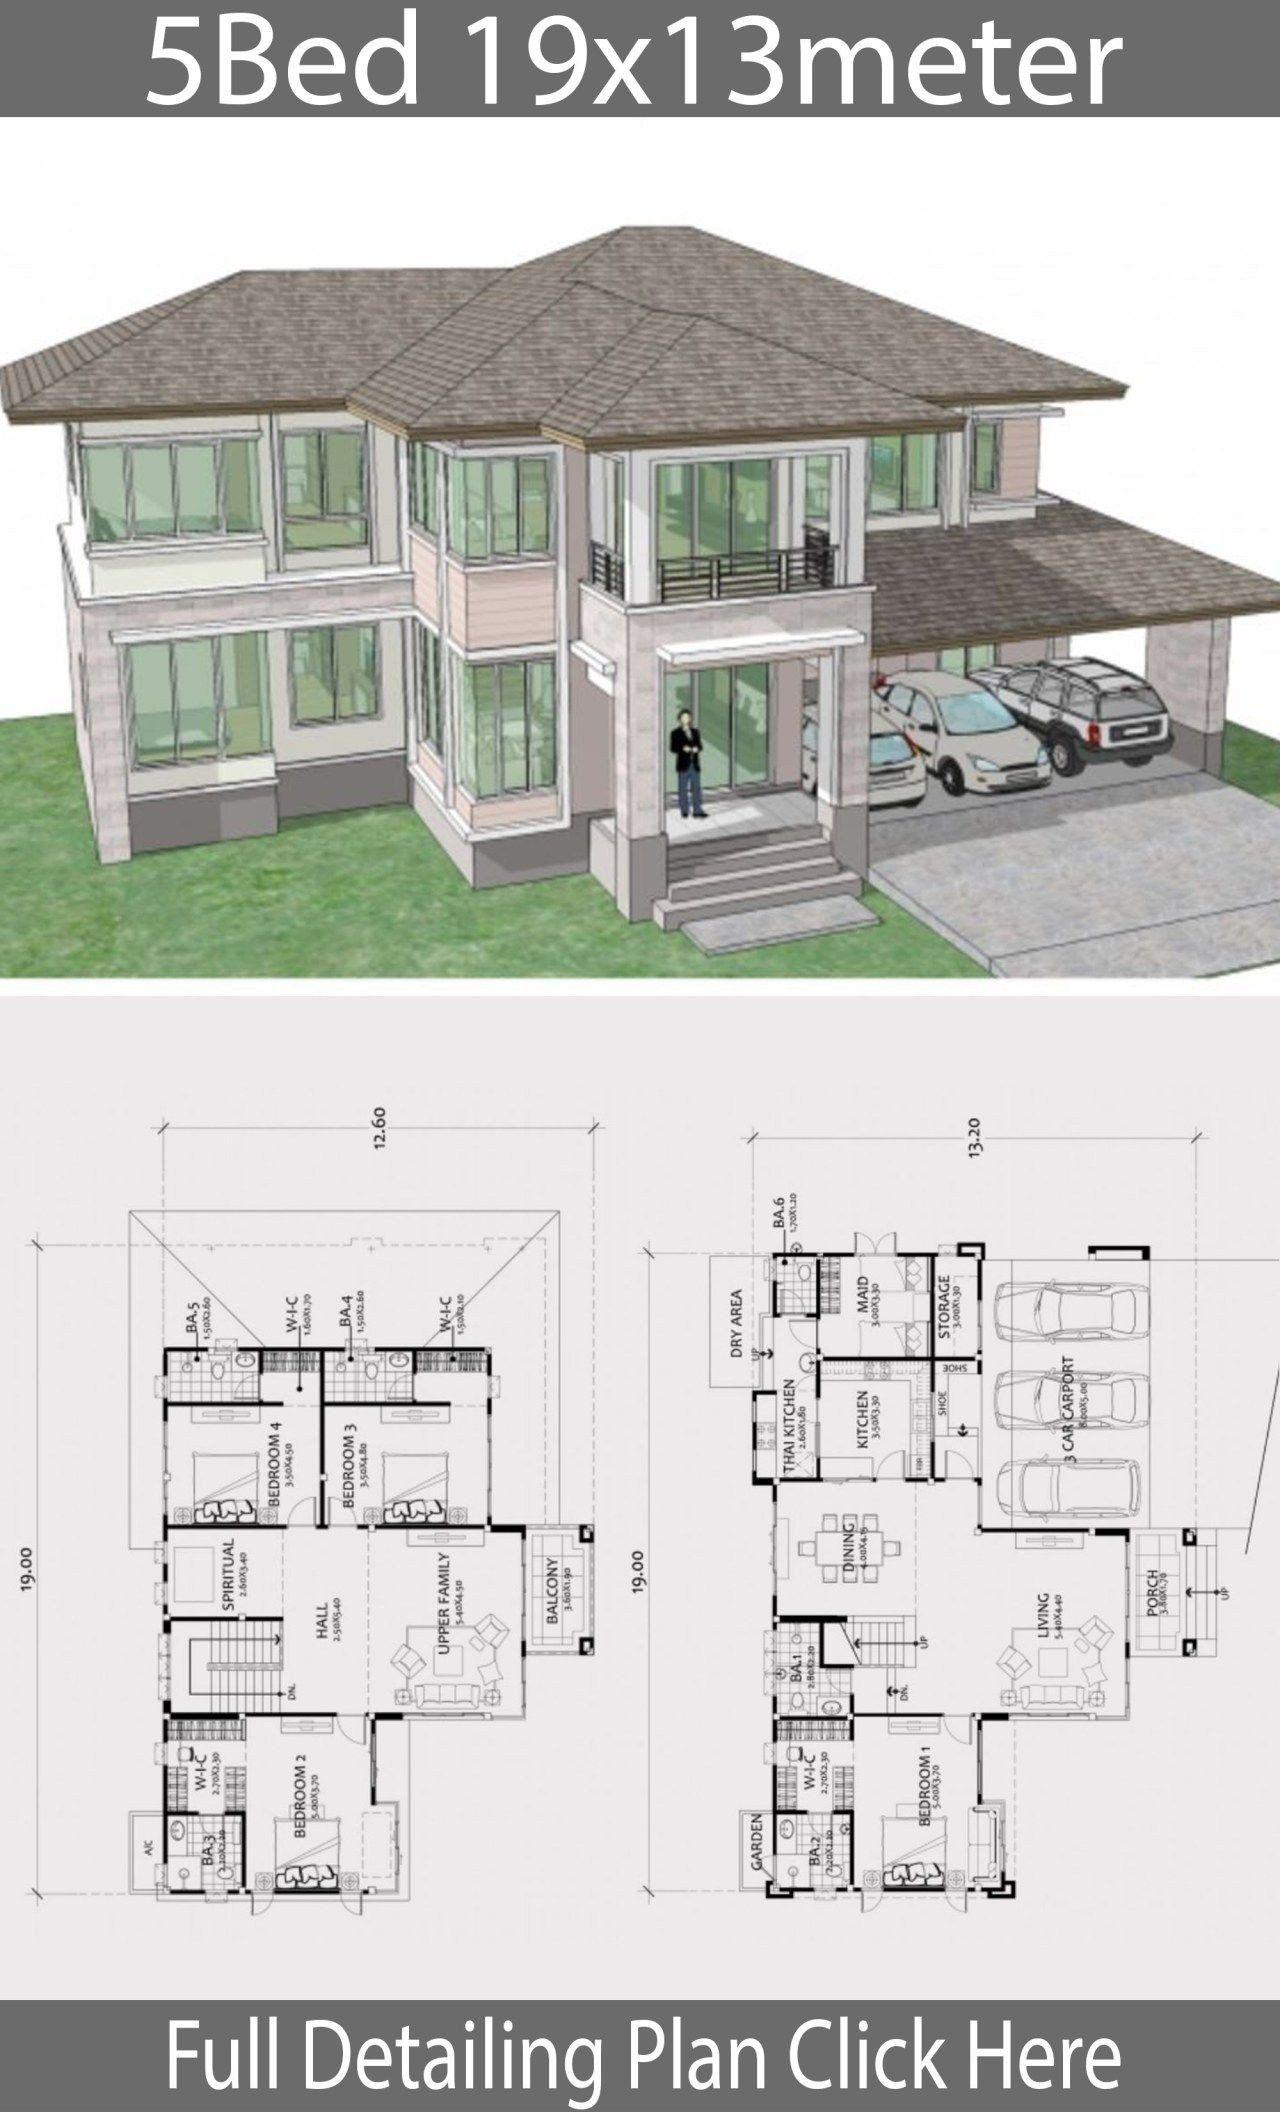 20 Big Modern House Floor Plans Plataran Best Denah Desain Rumah Tata Letak Rumah House Blueprints